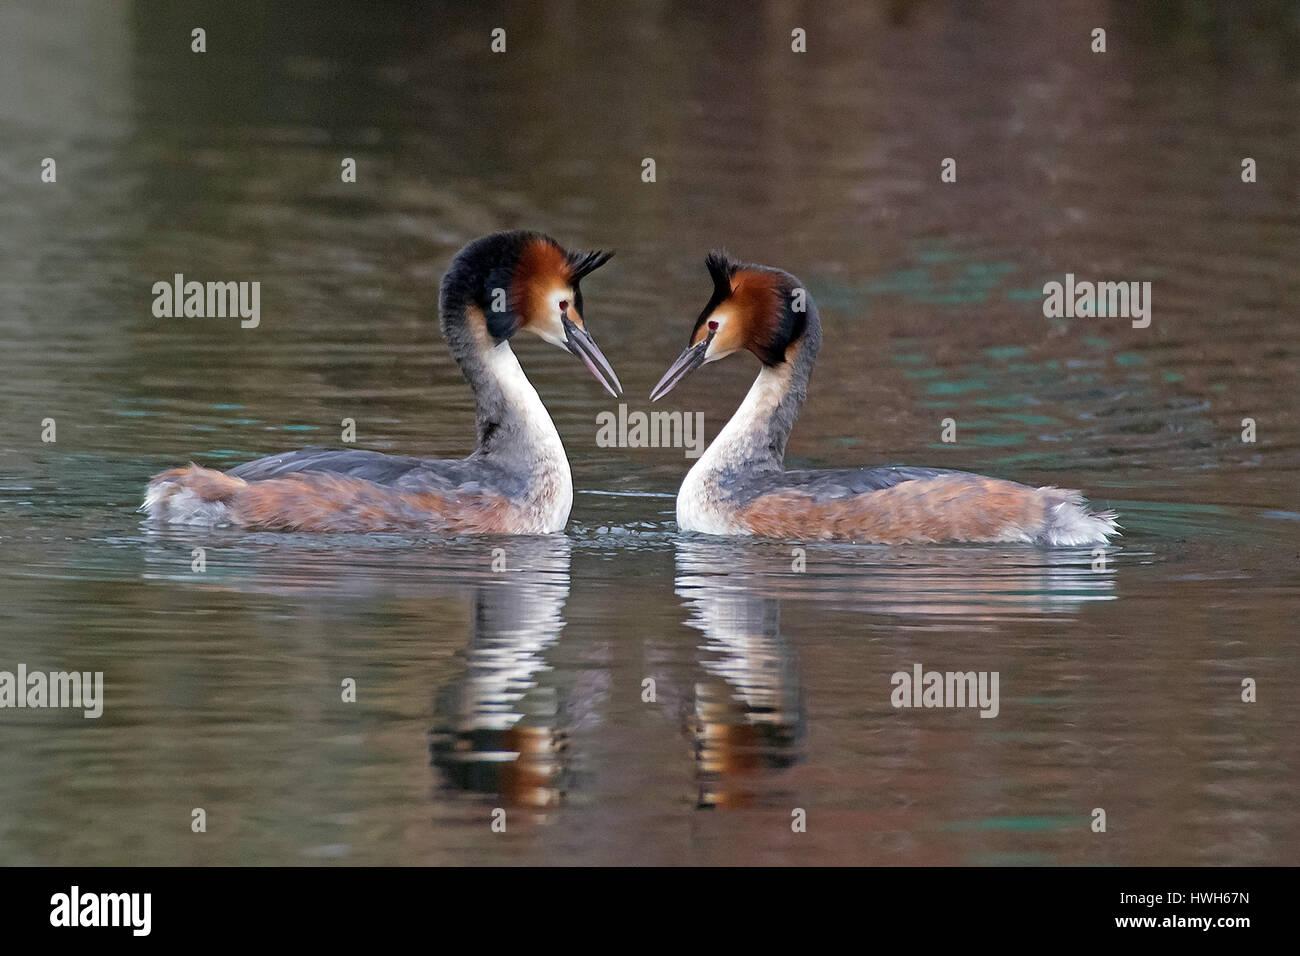 Bonnet diver in courtship display, Germany, Hamburg, birds, bonnet divers, podiceps cristatus, courtship display, - Stock Image